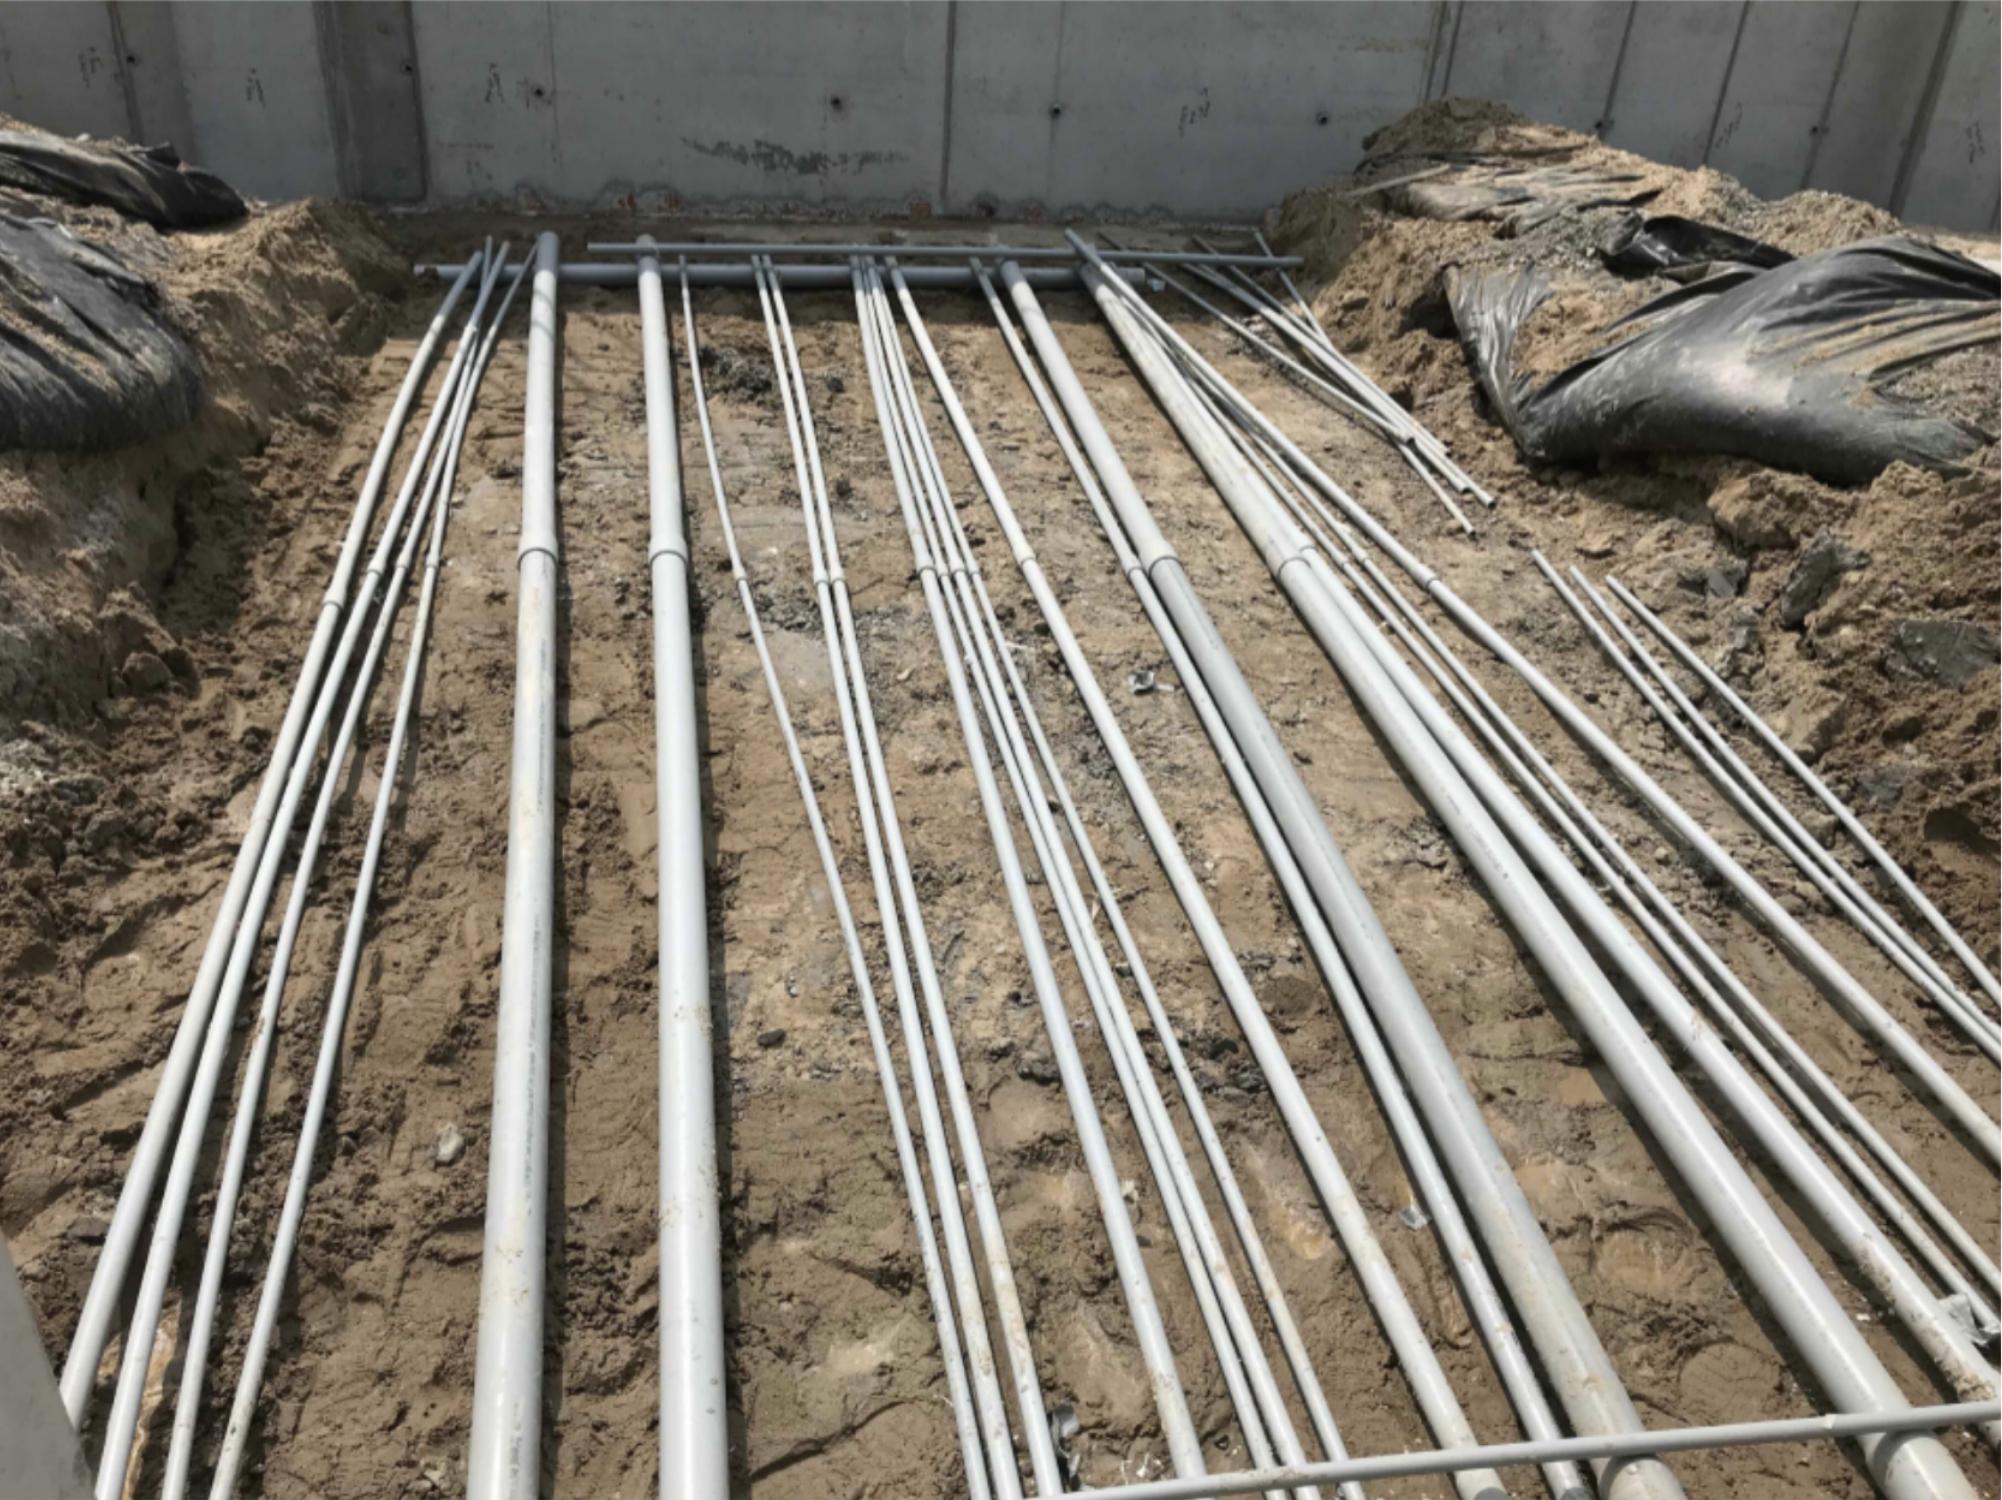 Underground electrical conduit in storage room